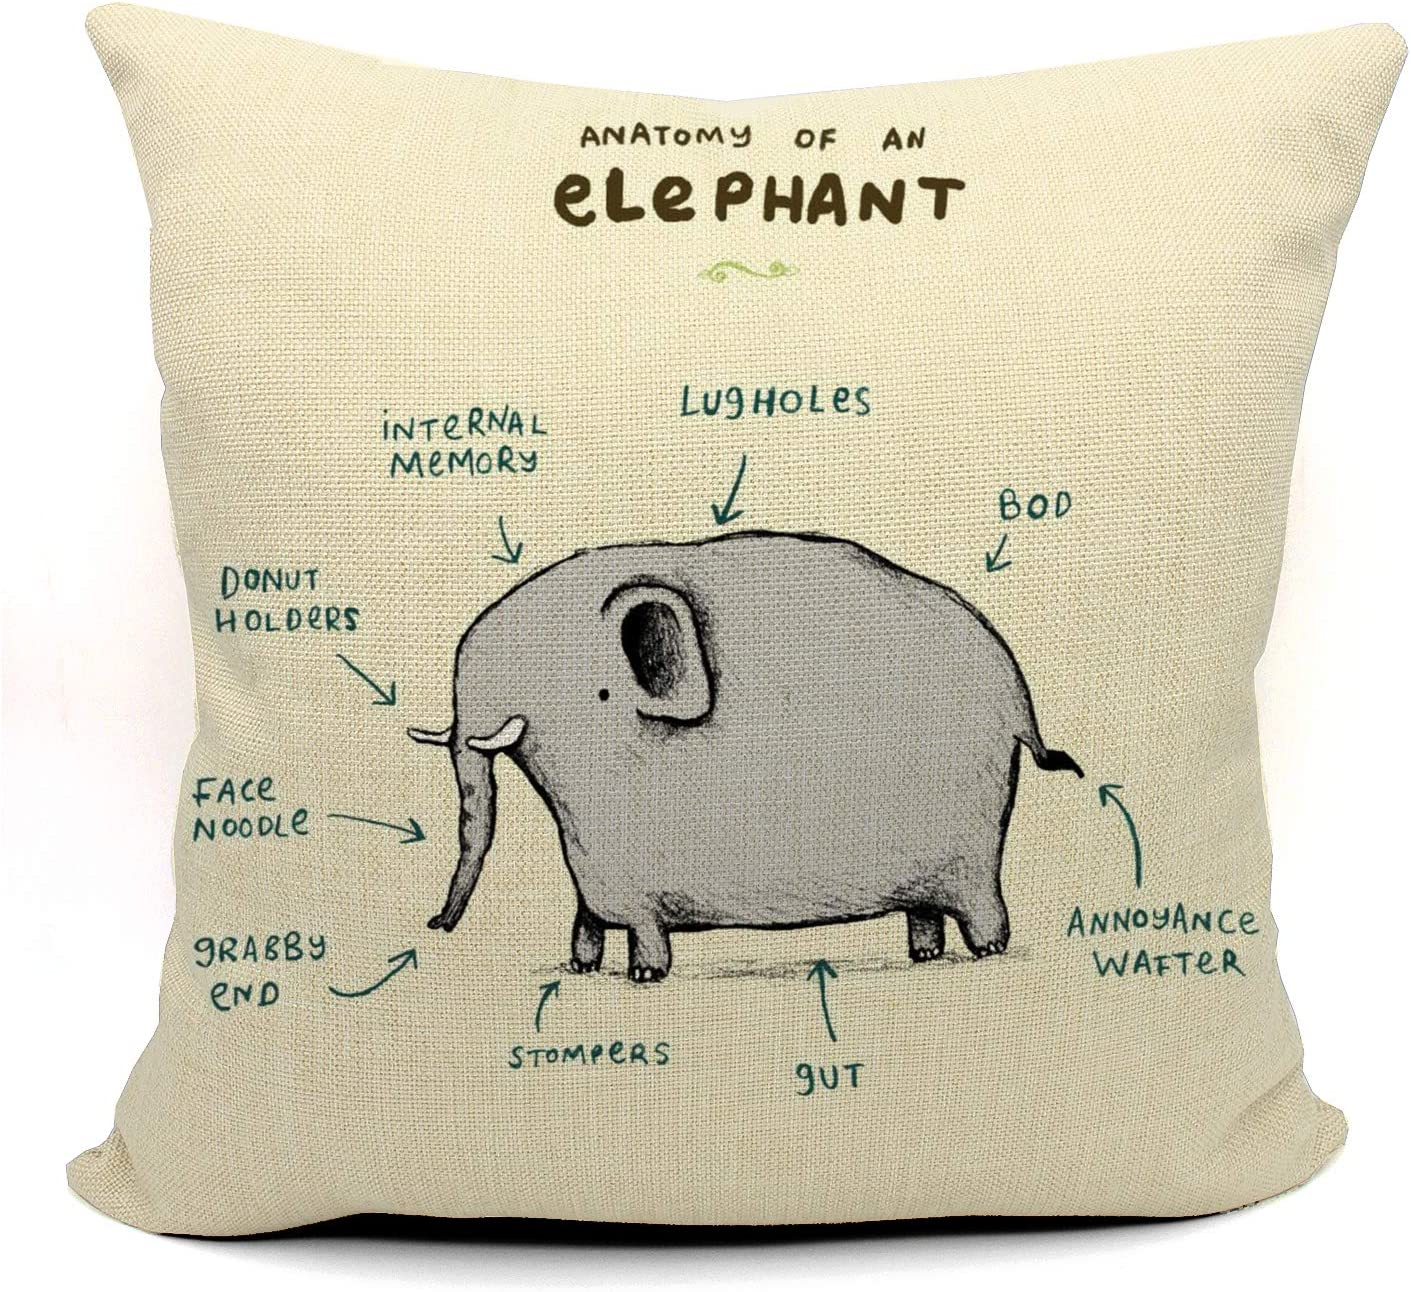 Funny Elephant Anatomy MapThrow Pillow Case, Elephant Lover Gifts, Funny Elephant Decor, Gifts Daughter, Son, Nursery Decor, Child Room Decor, 18 x 18 Inch Linen Cushion Cover for Sofa Couch Bed